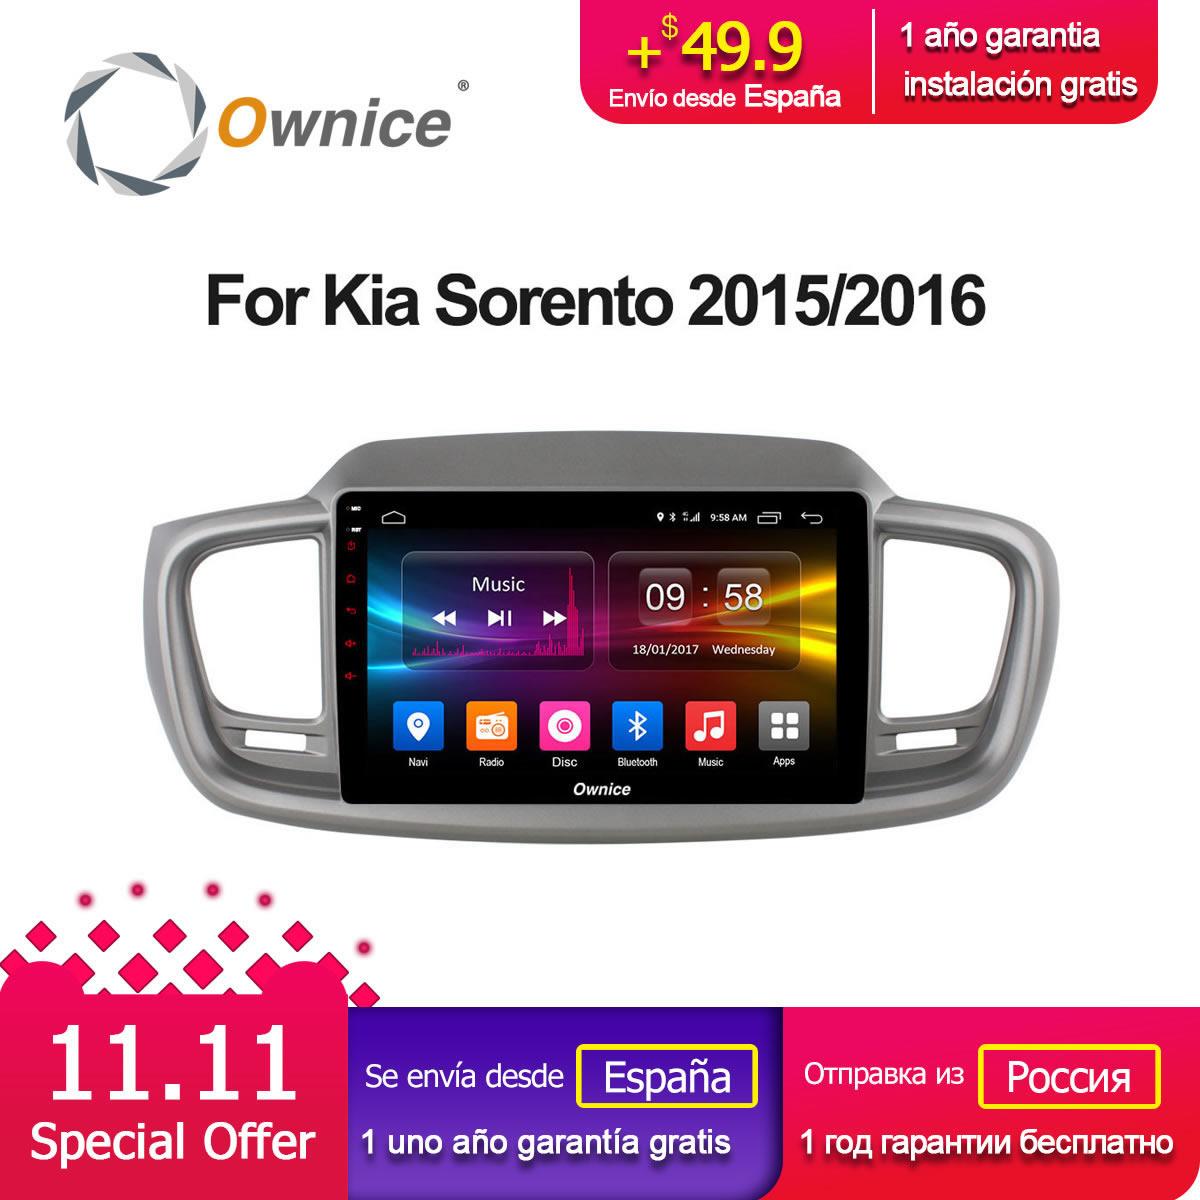 Ownice C500+ G10 Octa Core 10.1 Android 8.1 Car DVD Player Navi for Kia Sorento 2015 2016 stereo 4G LTE radio gps heat units ownice c500 4g sim lte octa 8 core android 6 0 for kia ceed 2013 2015 car dvd player gps navi radio wifi 4g bt 2gb ram 32g rom